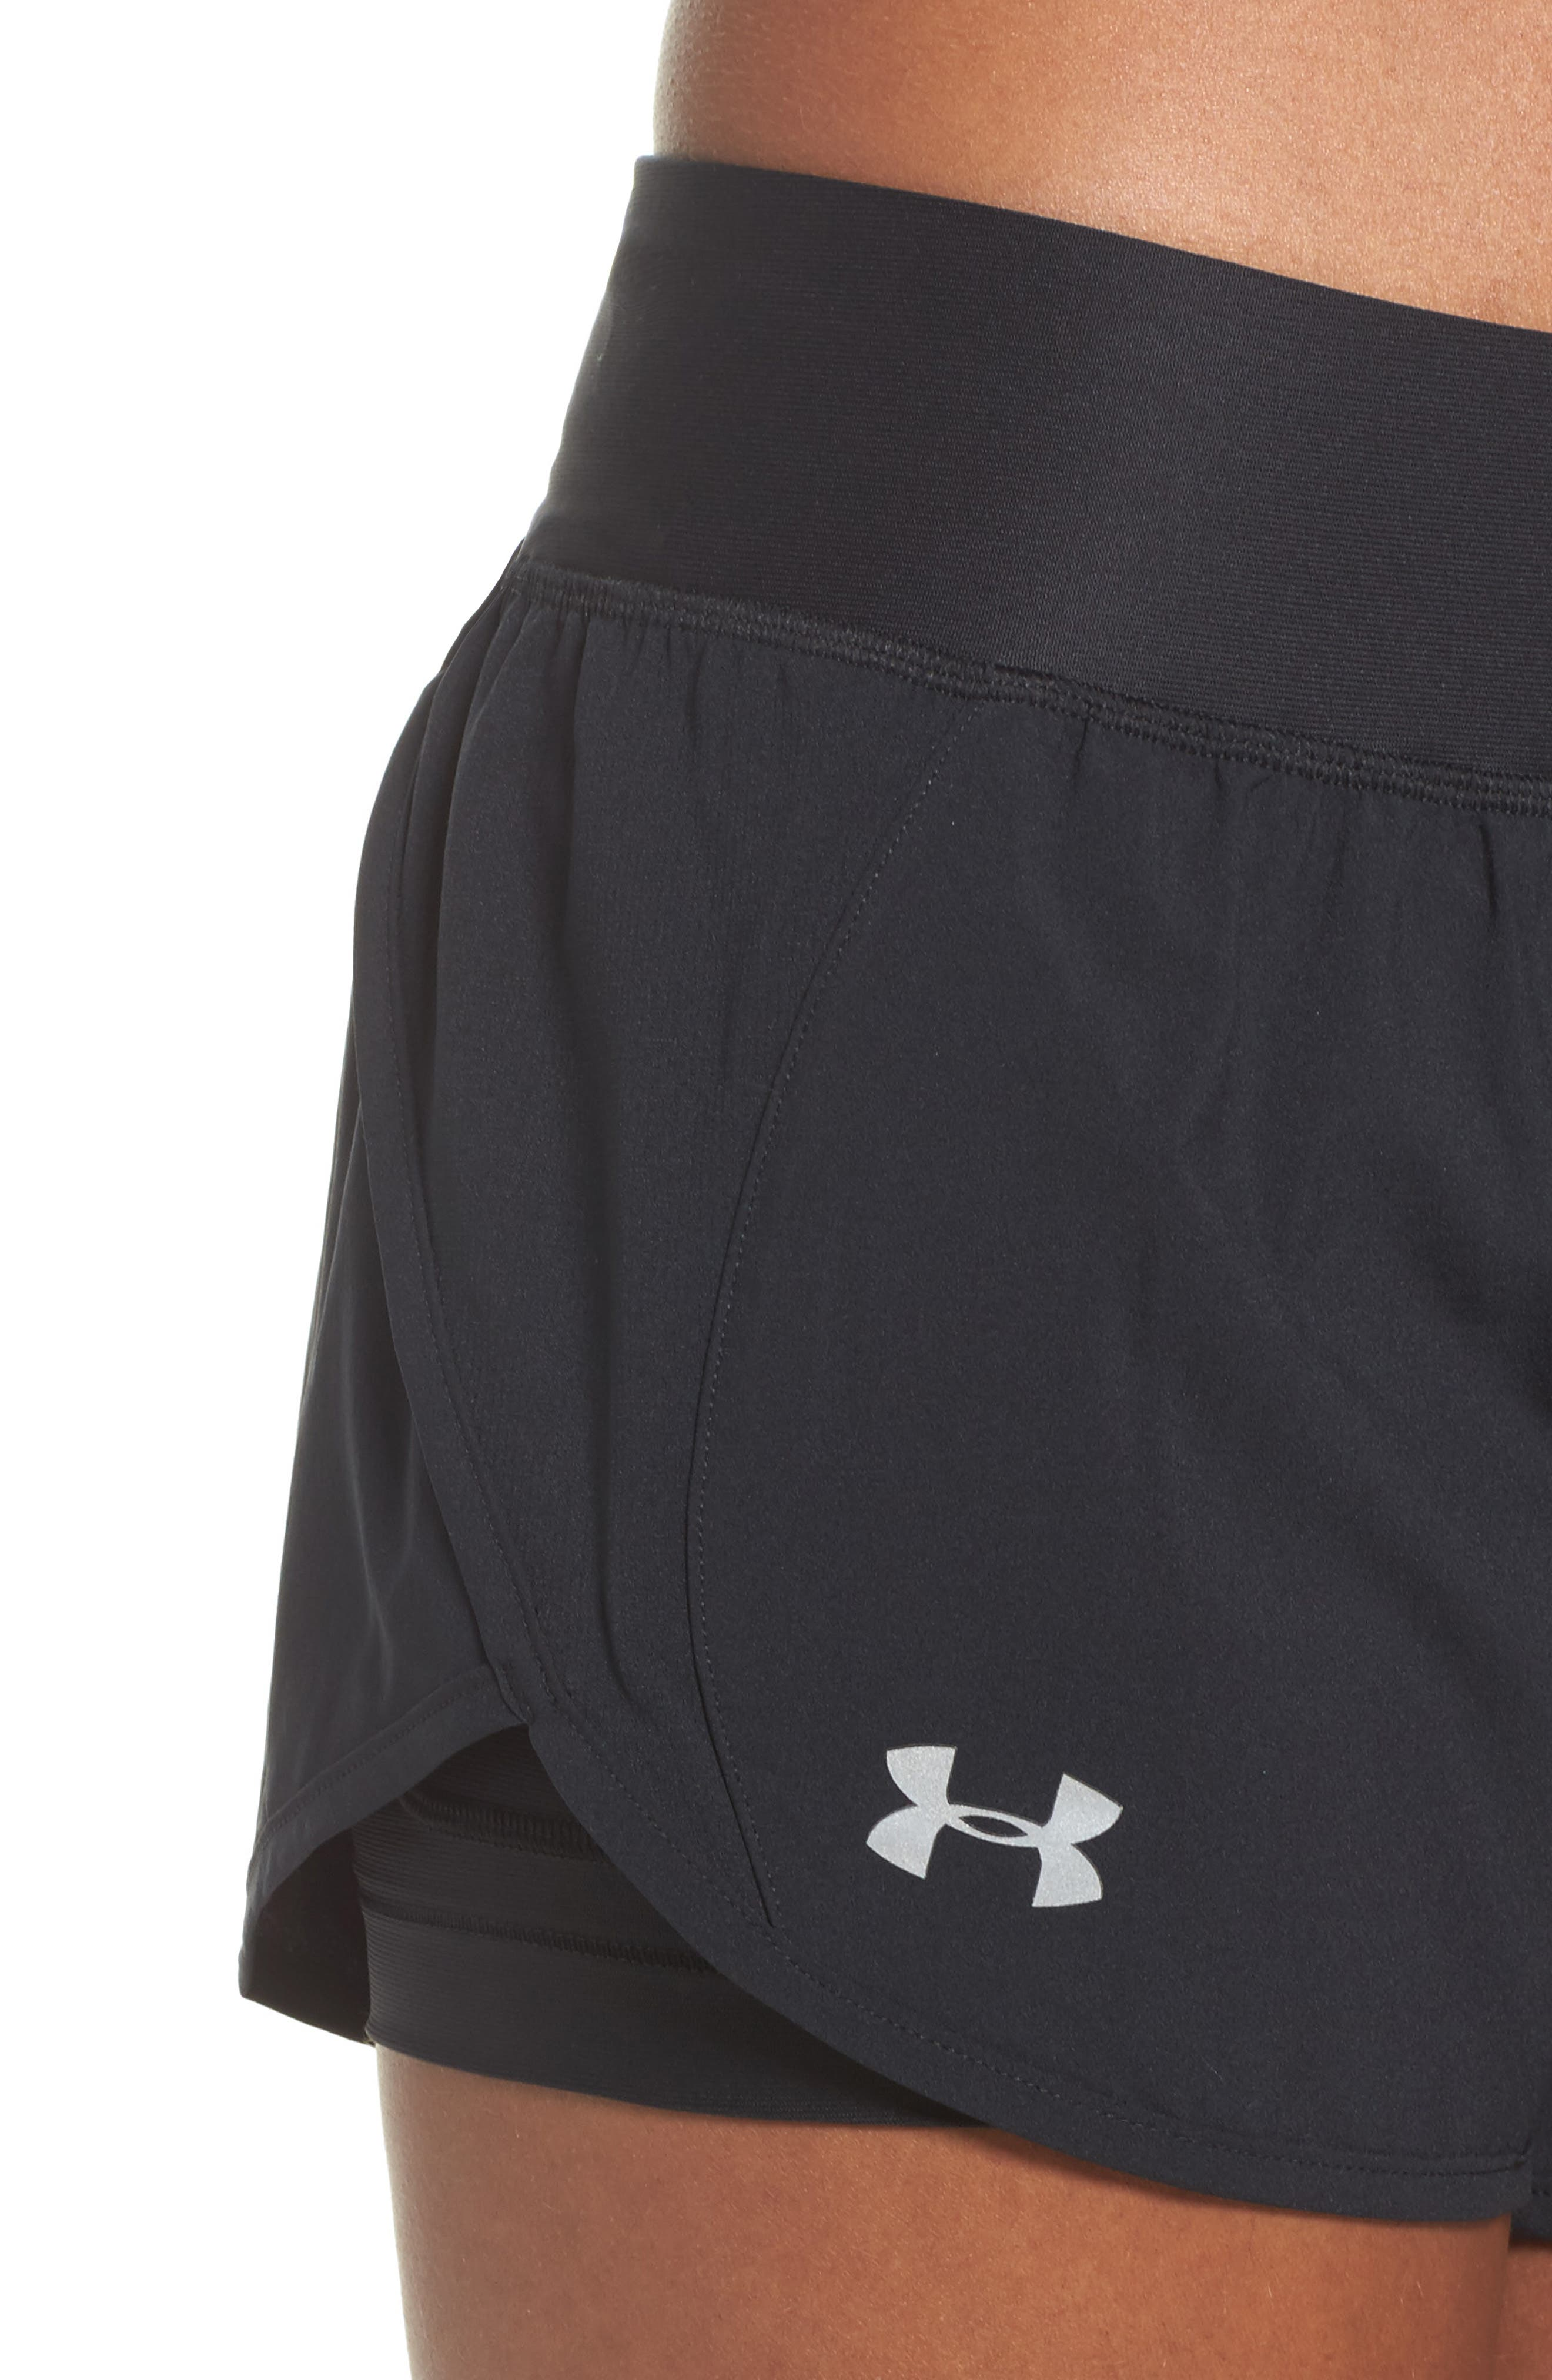 Launch Tulip Running Shorts,                             Alternate thumbnail 4, color,                             Black/ Black/ Reflective